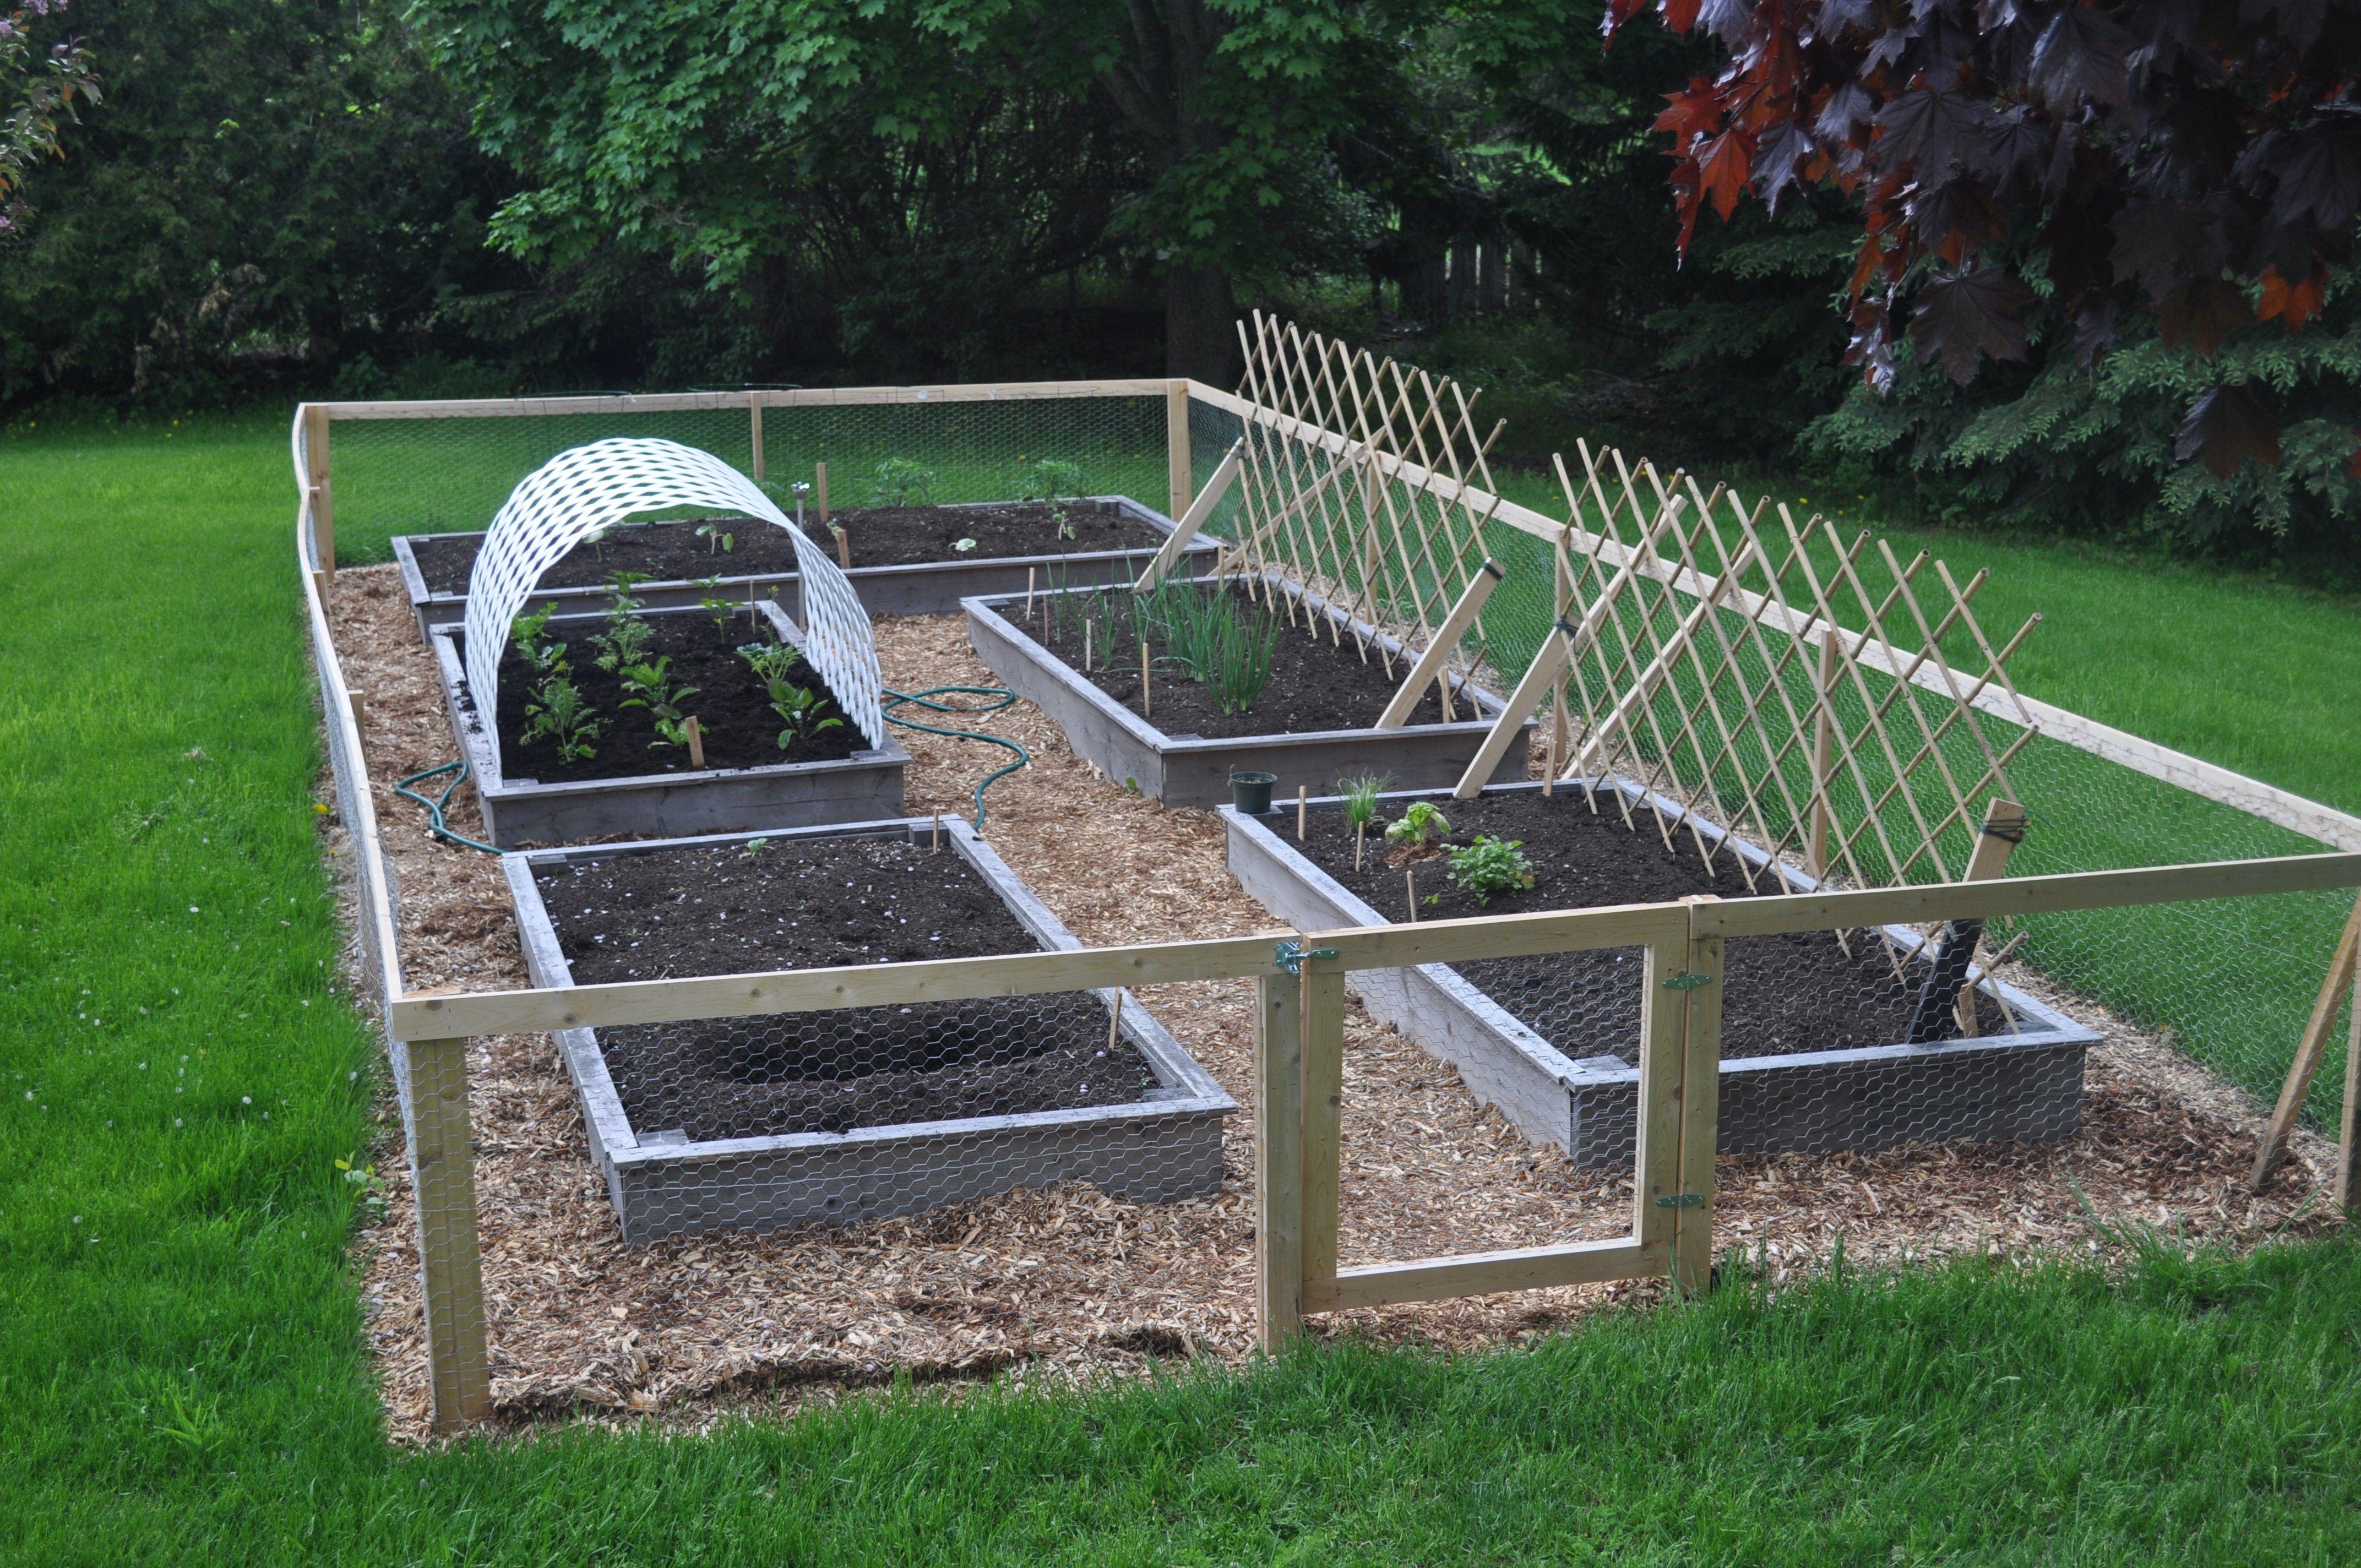 Easy backyard garden with raised beds build from reclaimed cedar ...